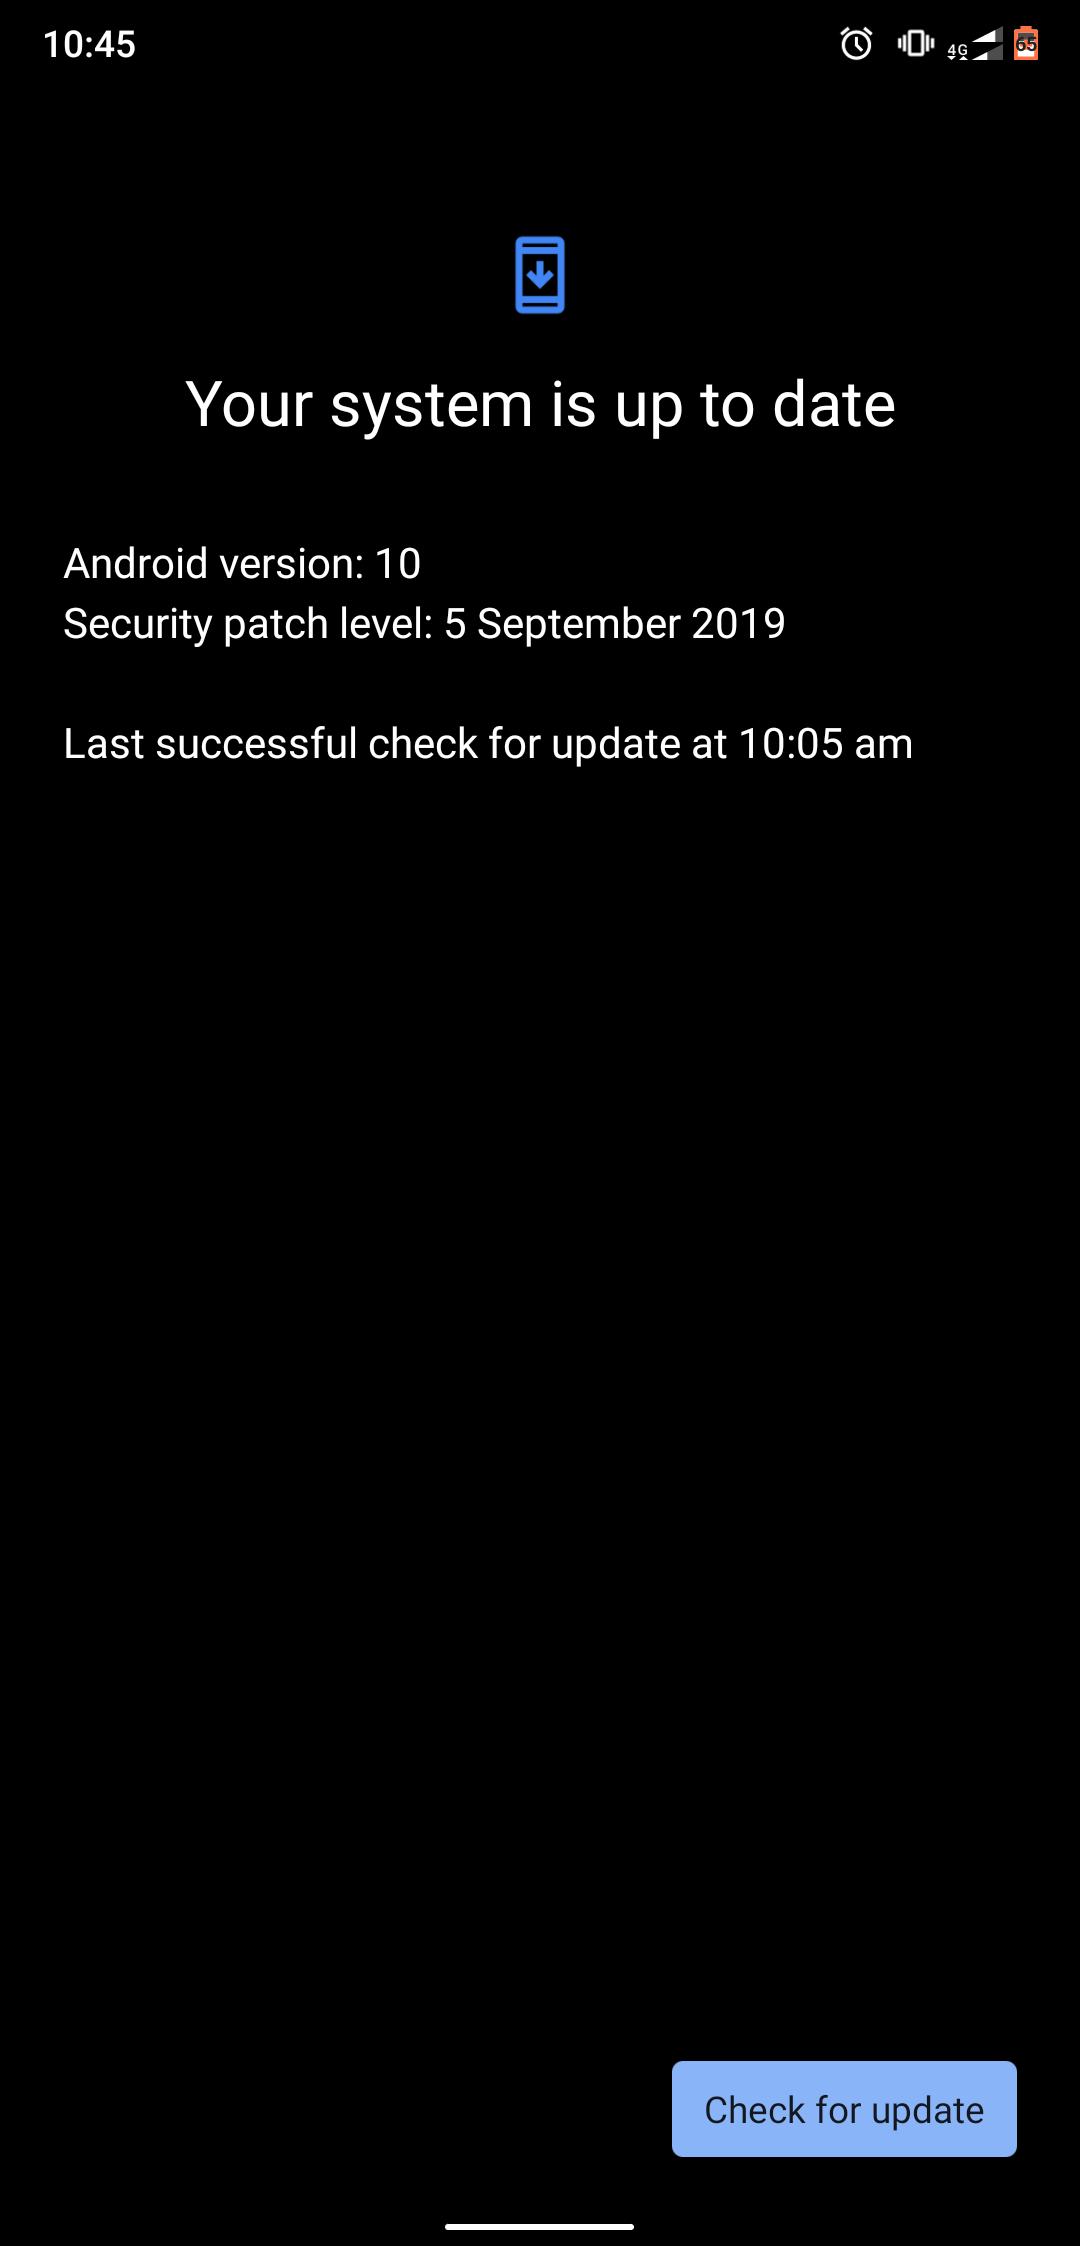 Screenshot_20200402-104537.png